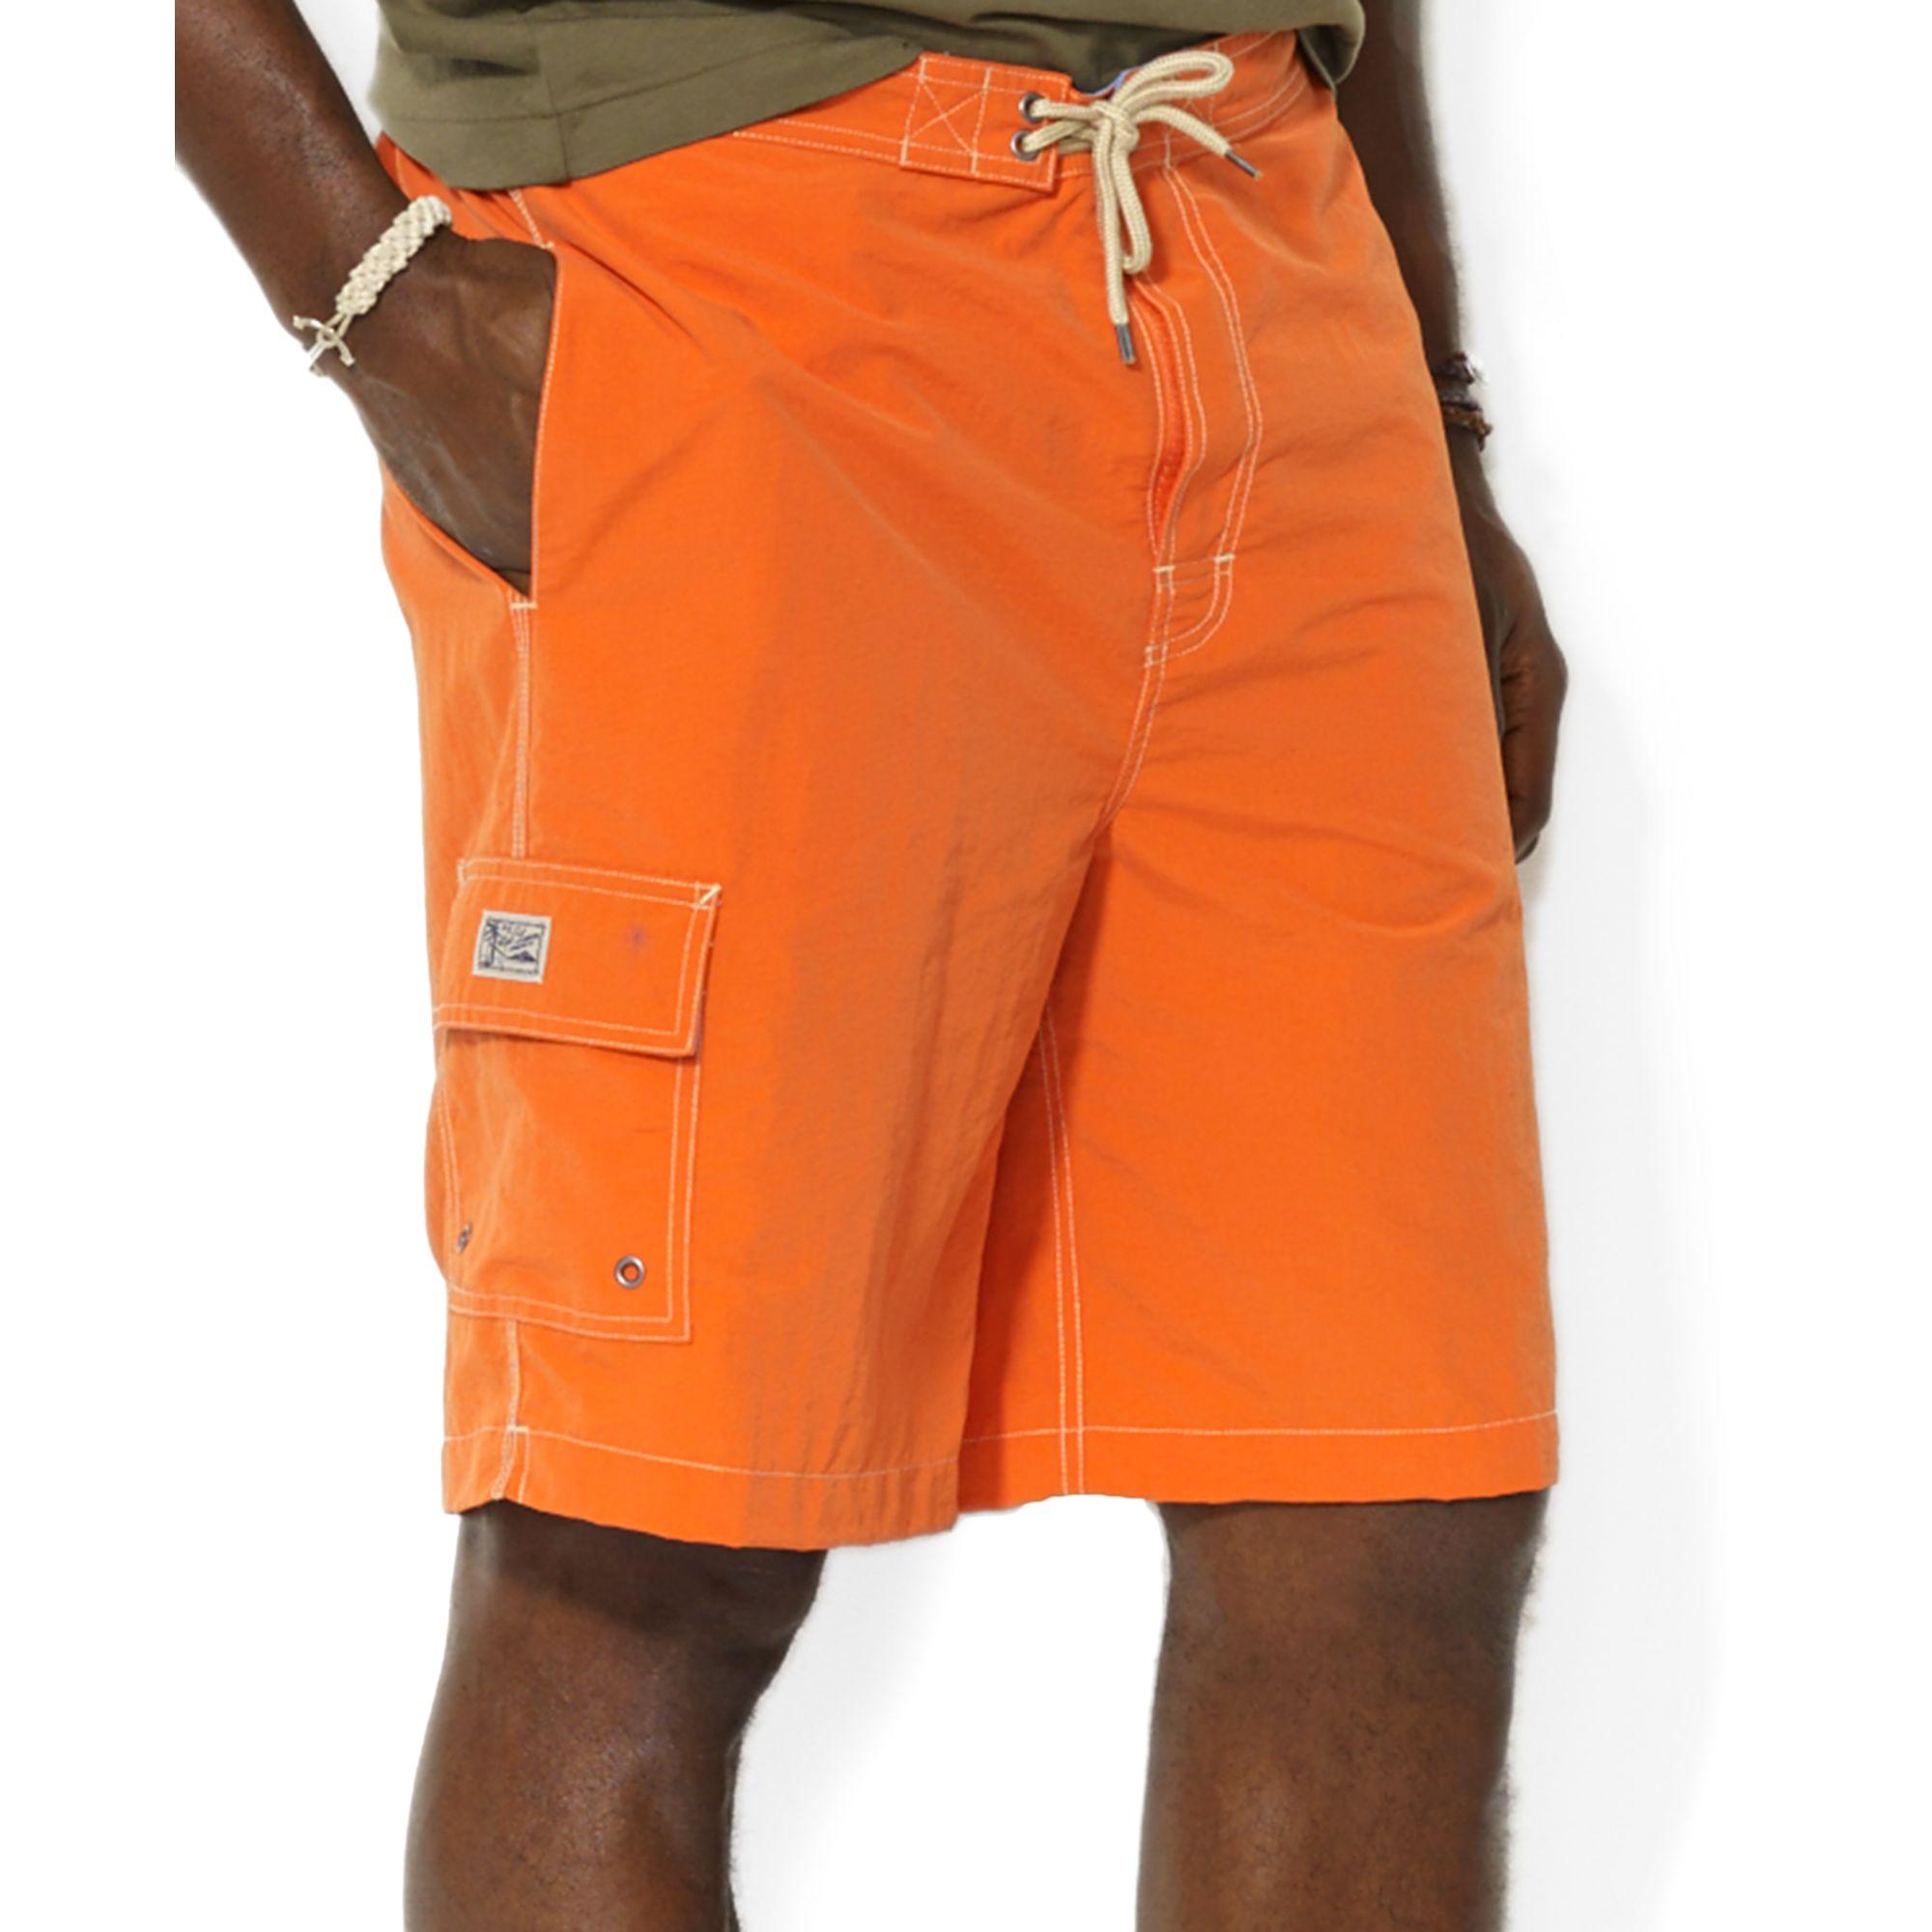 6208bbf8dc Ralph Lauren Polo Big and Tall Kailua Swim Trunks in Orange for Men ...